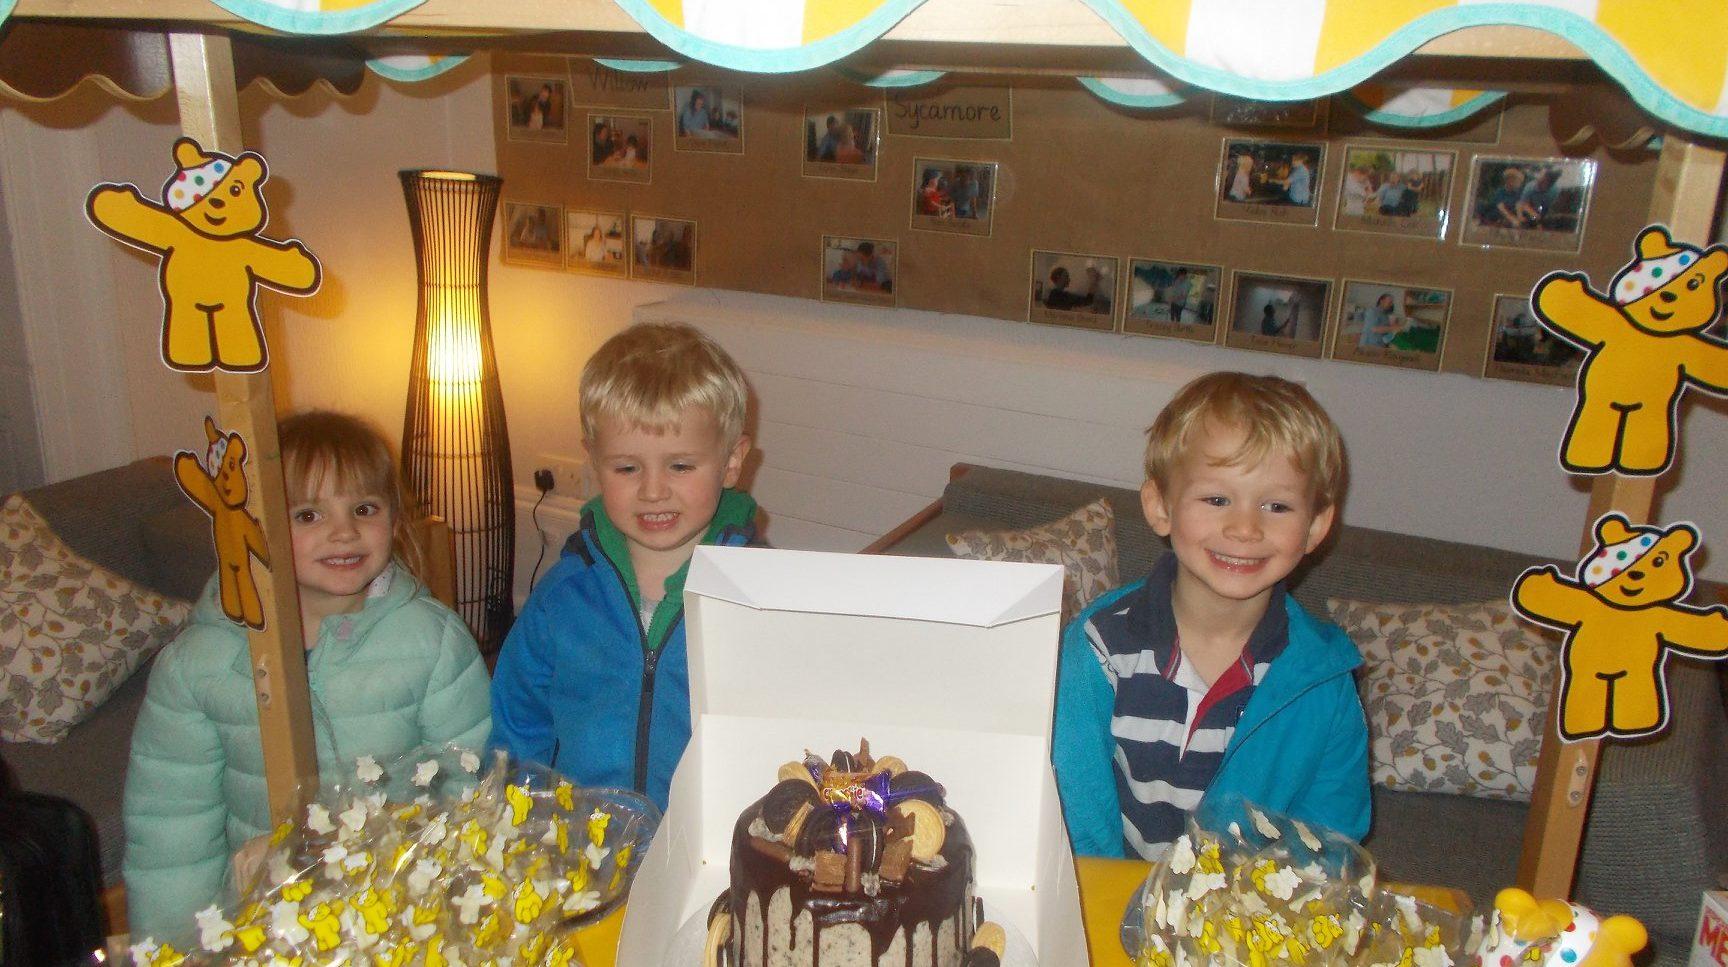 Childern selling cakes